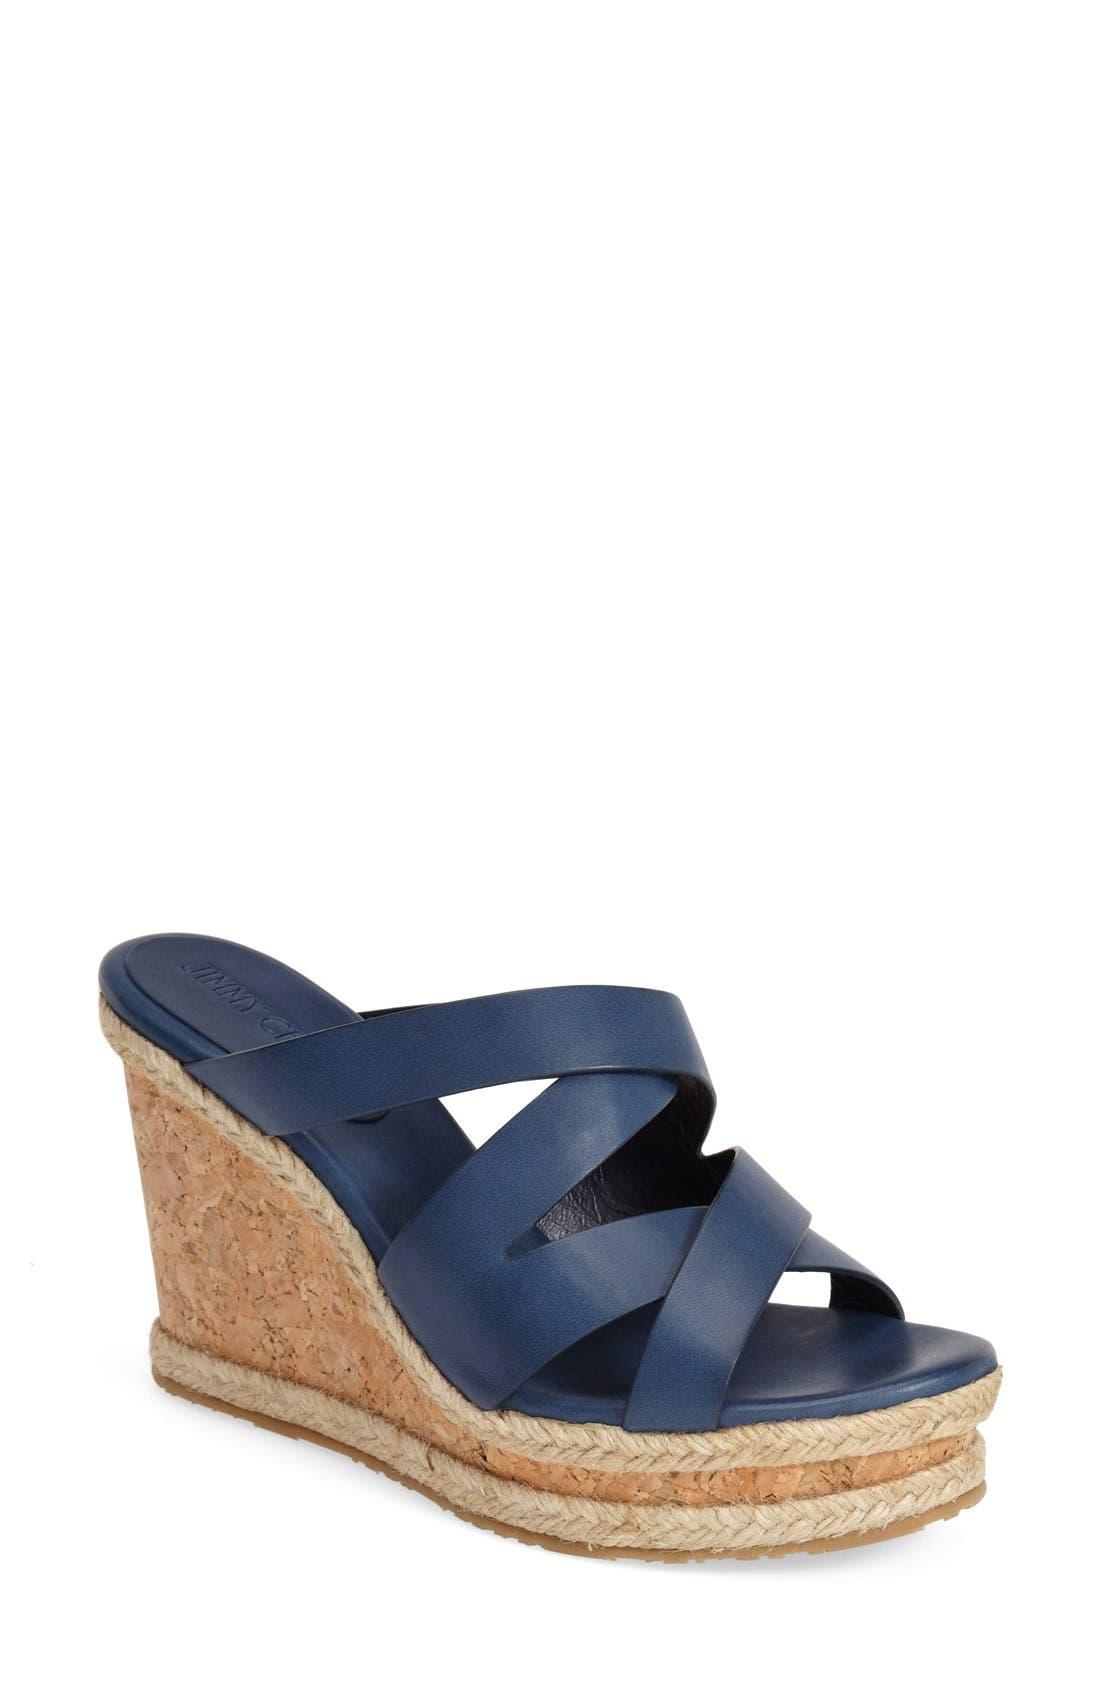 'Prisma' Leather Wedge Sandal,                             Main thumbnail 1, color,                             400